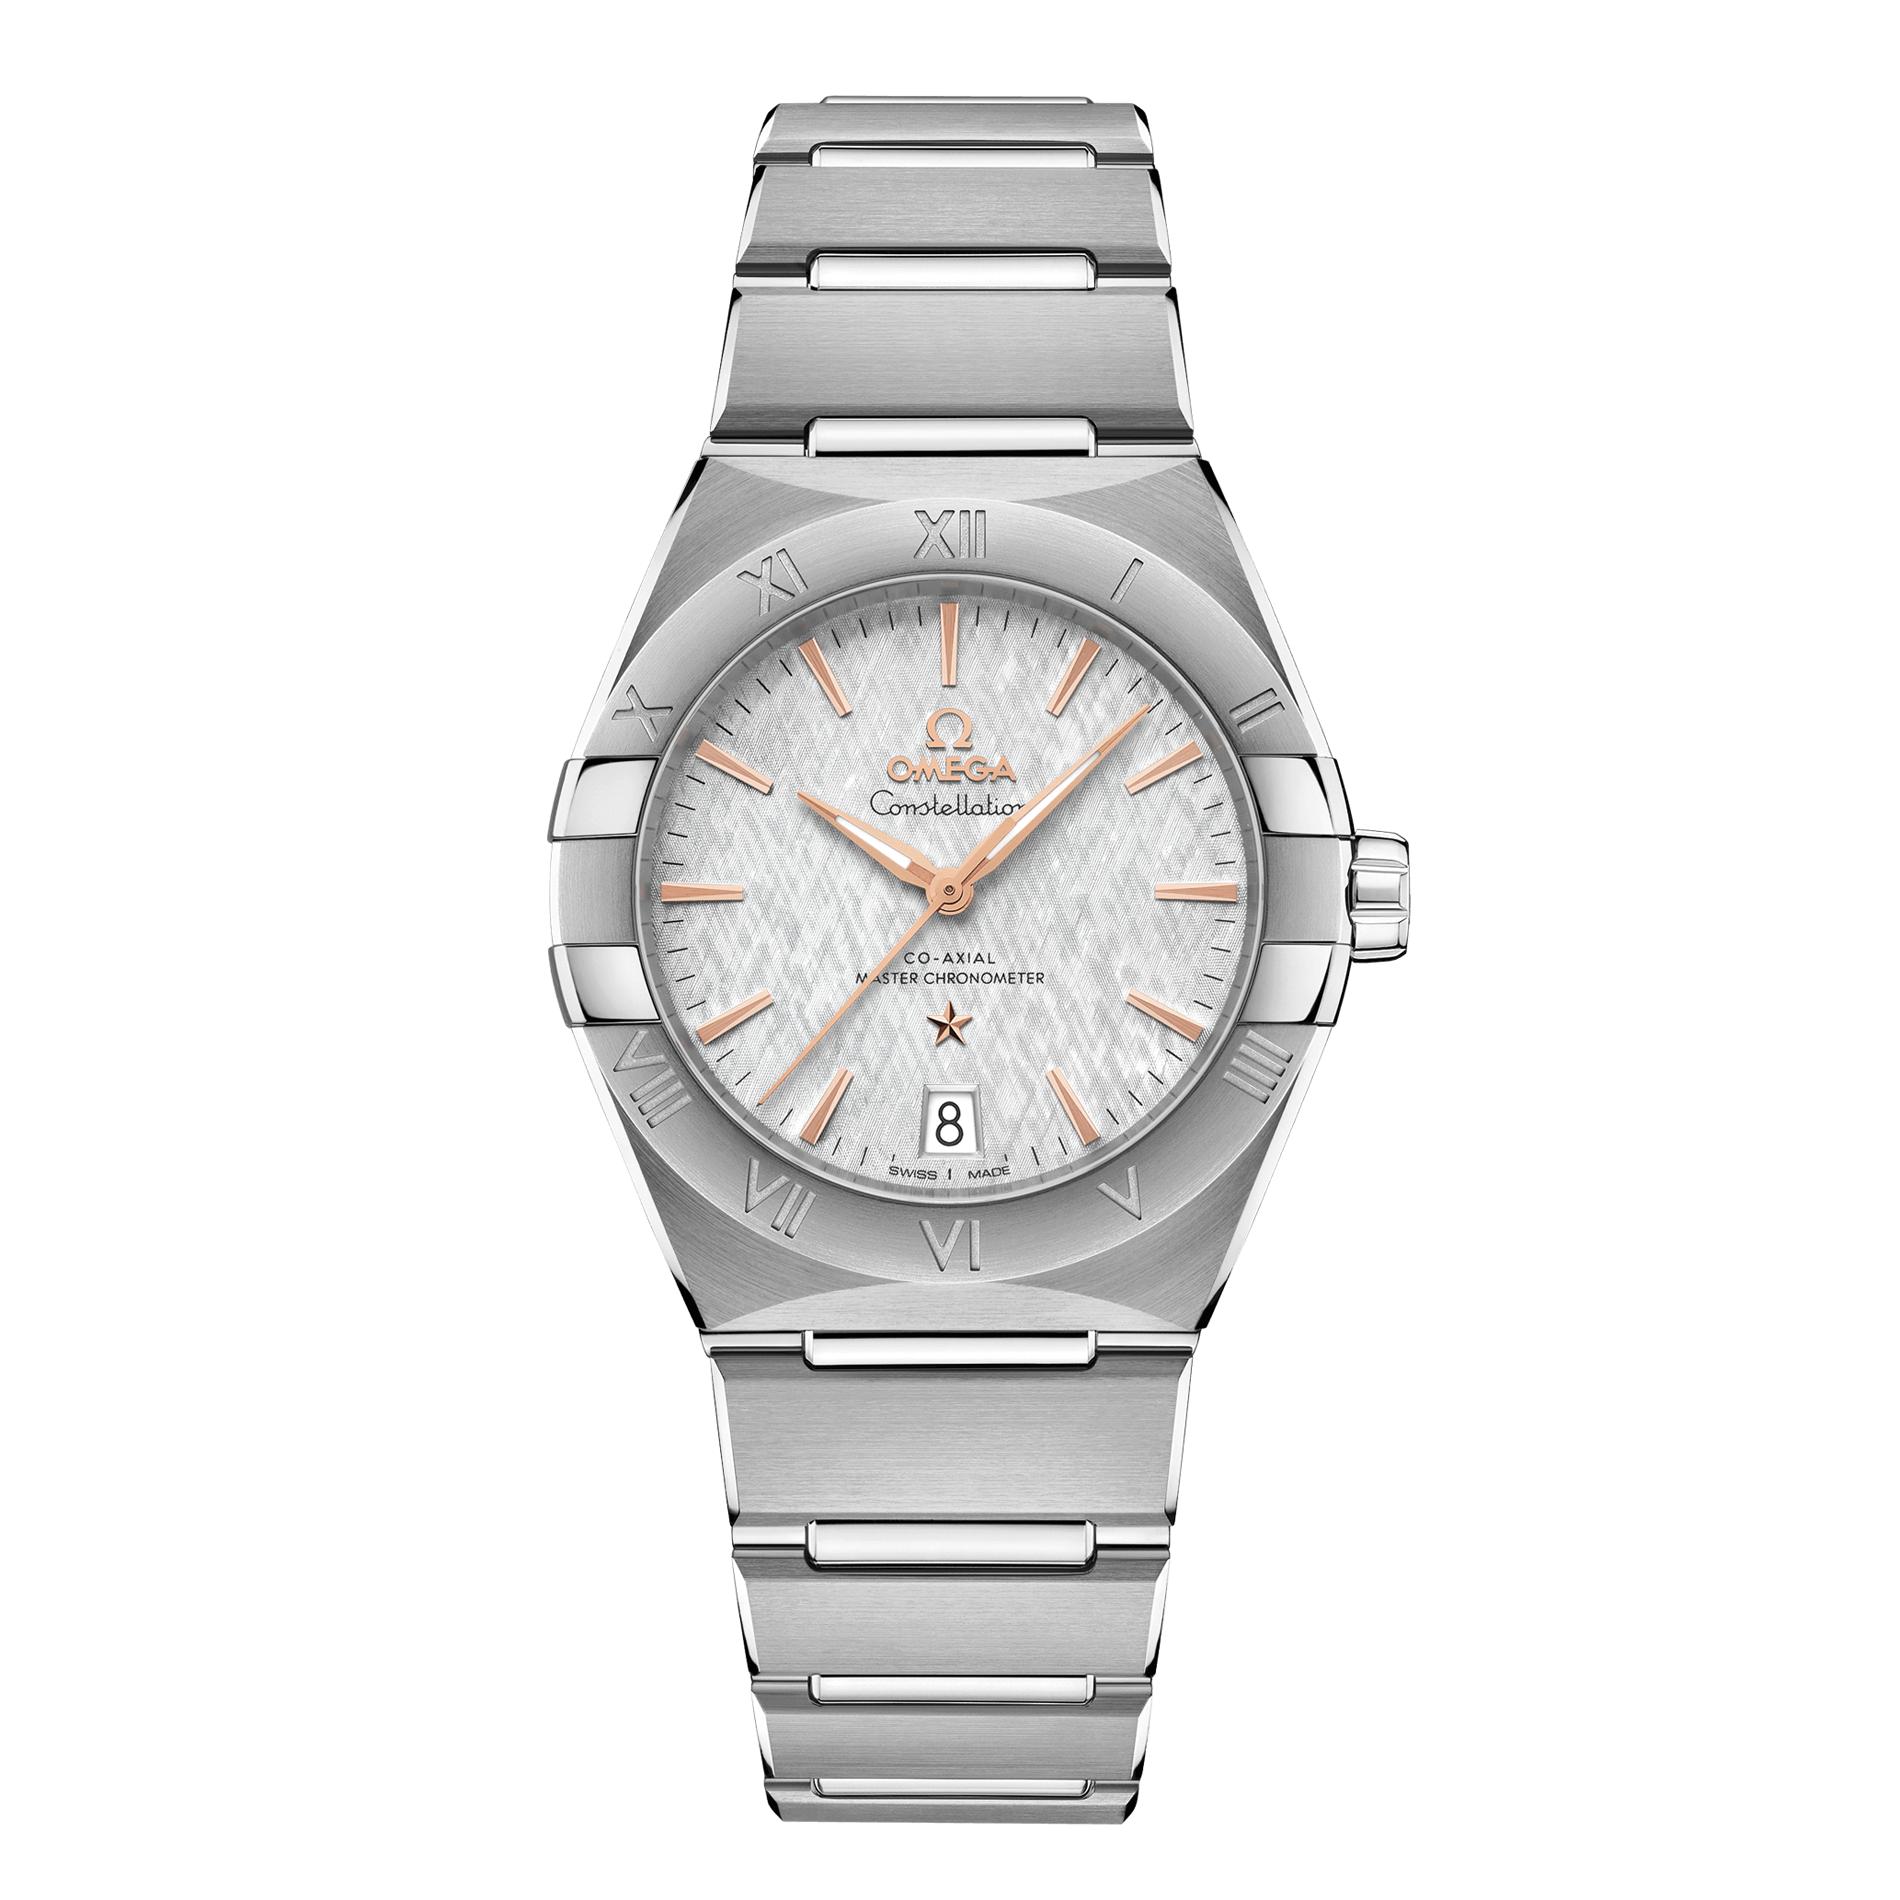 Reloj Omega – Constellation Co-Axial Master Chronometer 36 - Amaya Joyeros